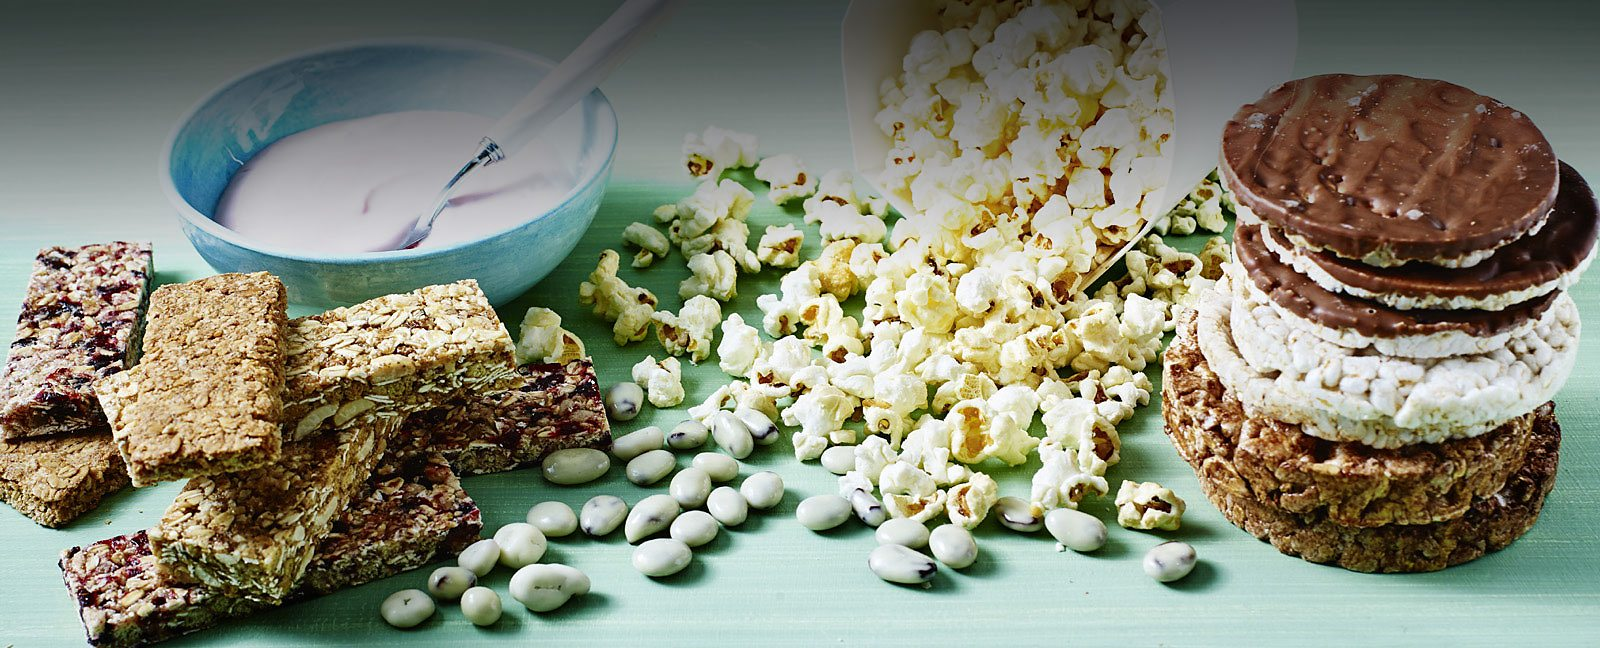 BBC iWonder - Do diet foods make you fatter?